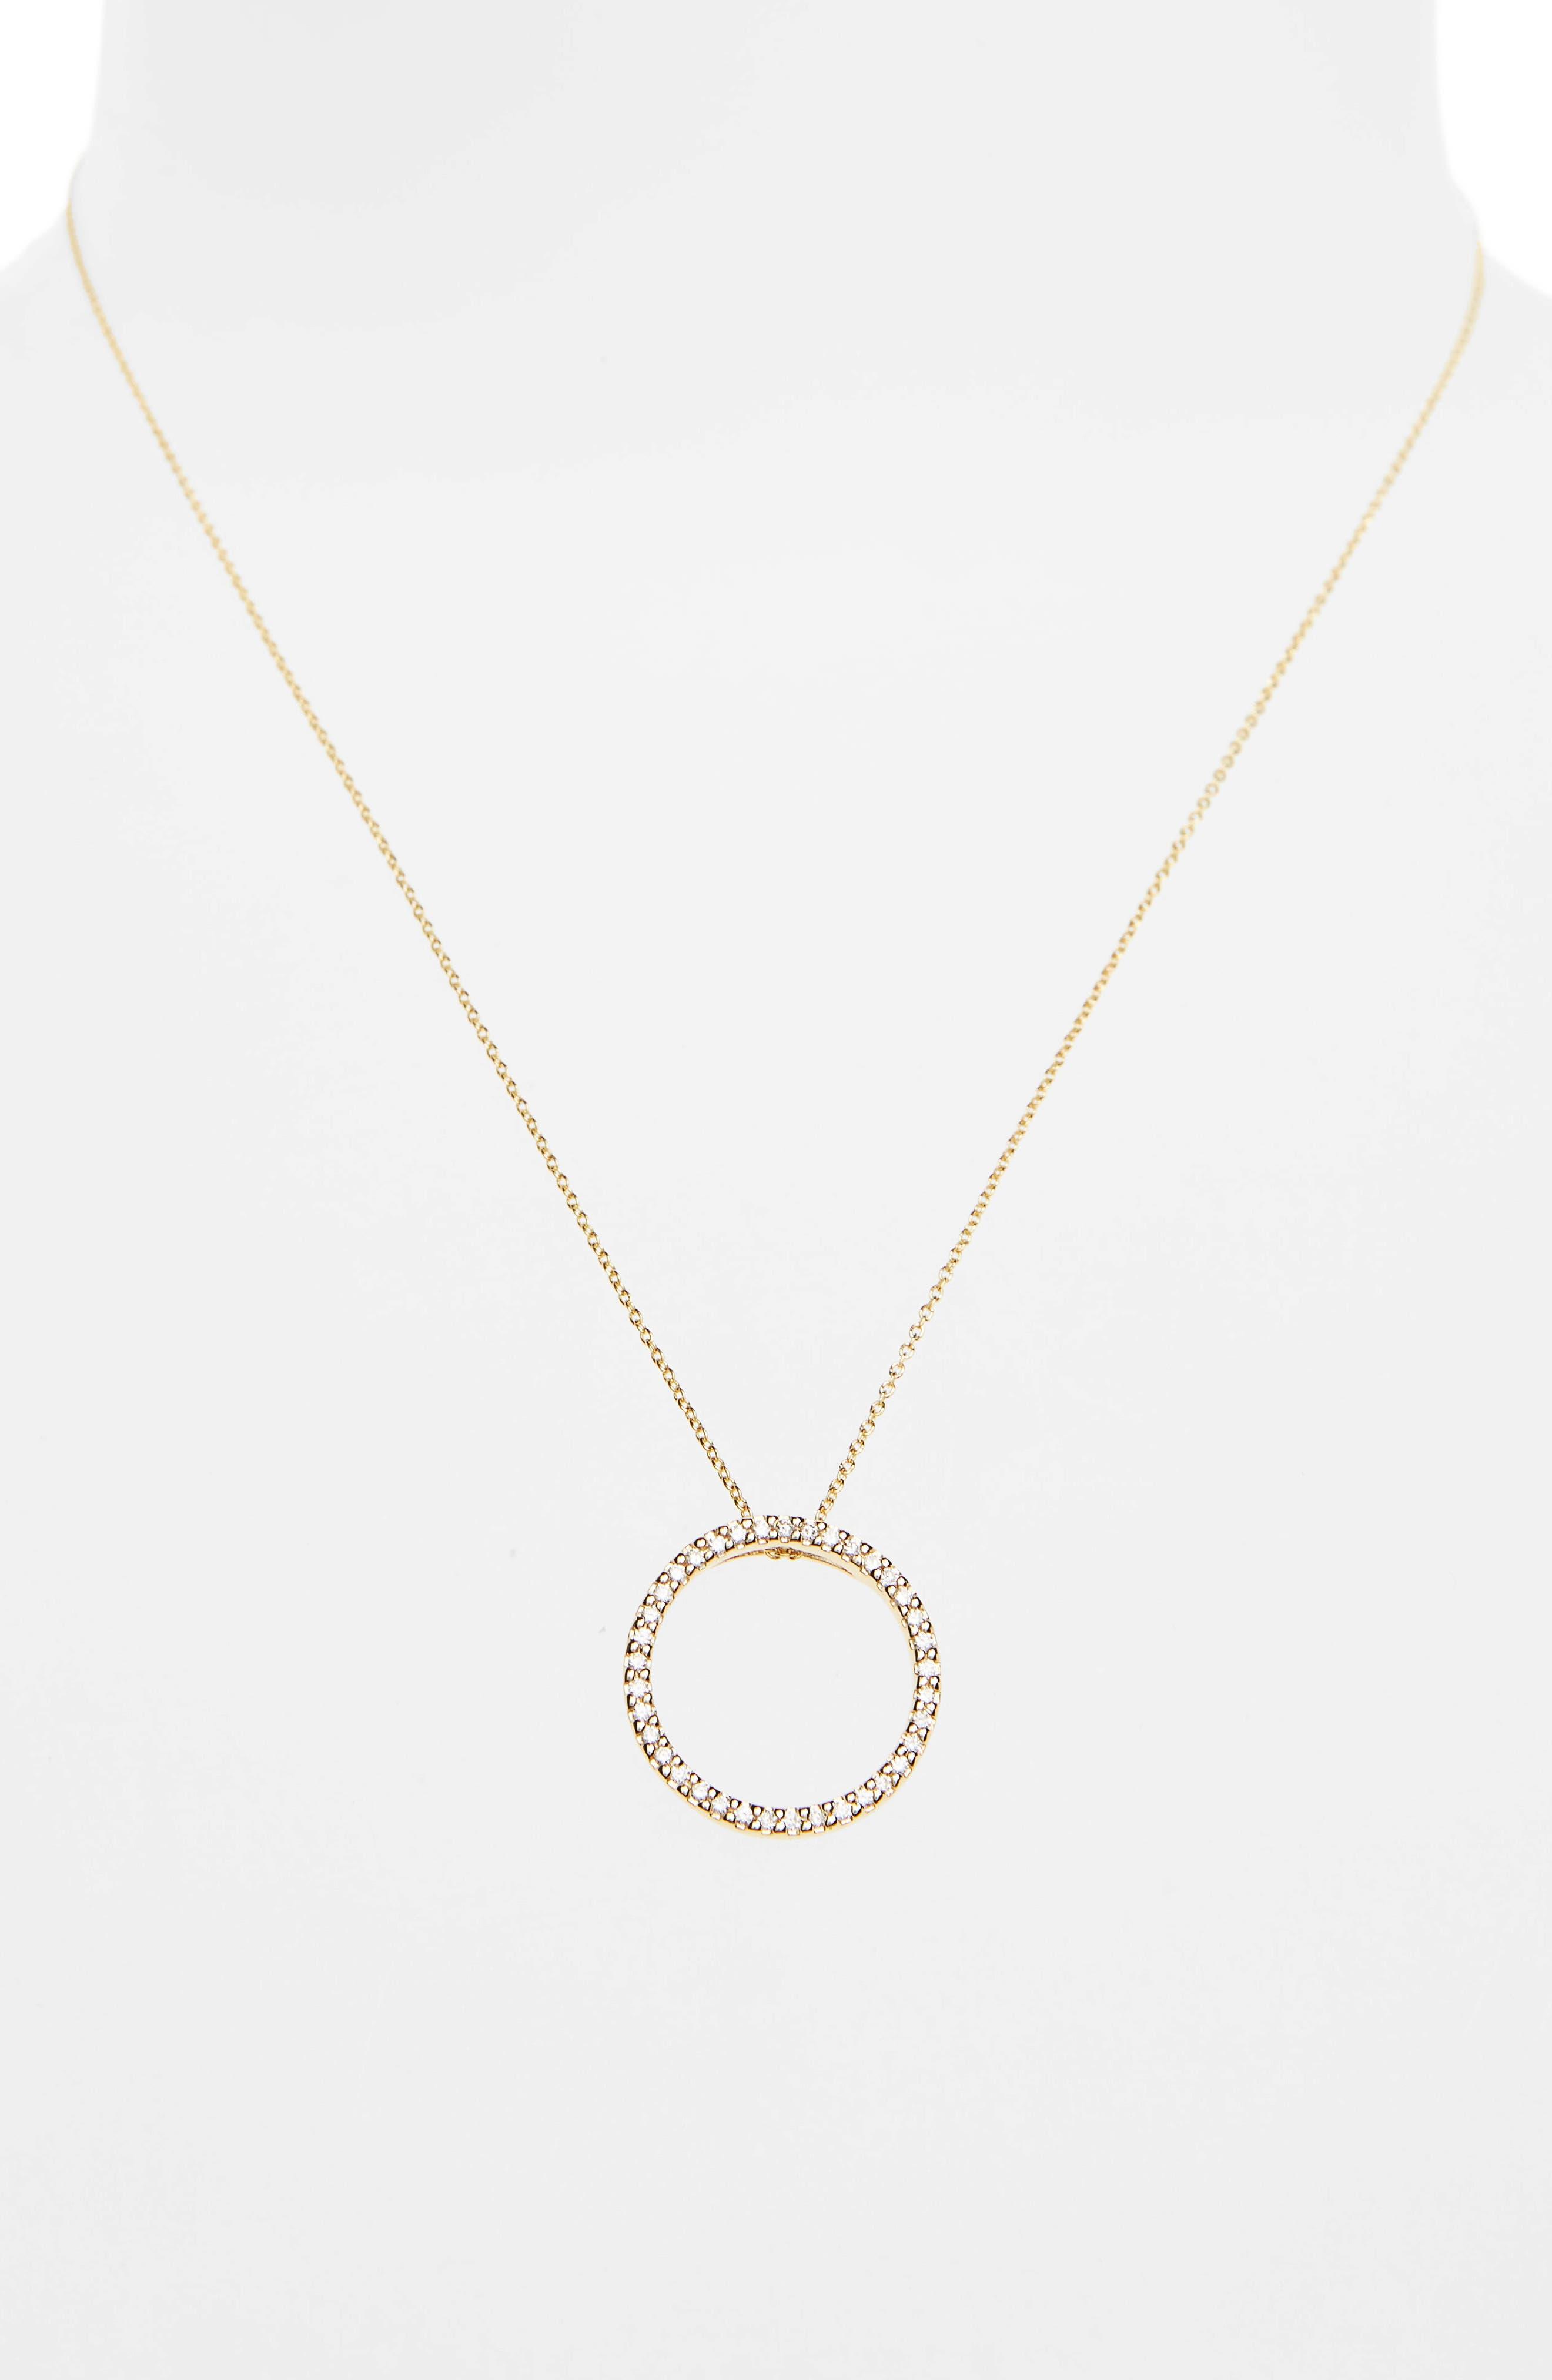 Diamond Circle Necklace,                             Alternate thumbnail 2, color,                             YELLOW GOLD